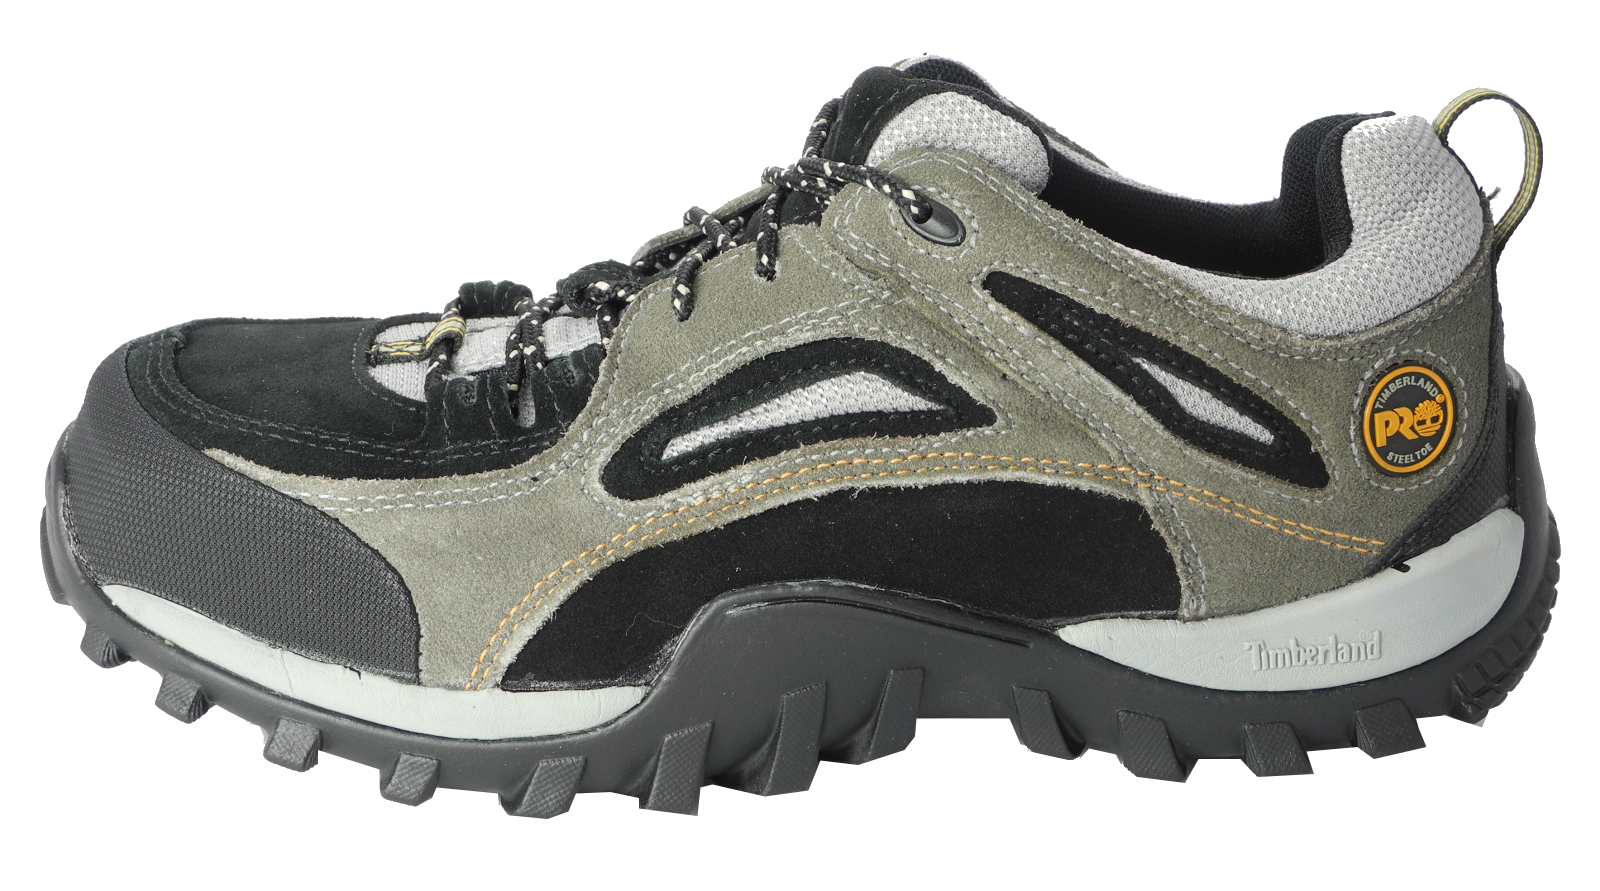 timberland pro mudsill steel toe